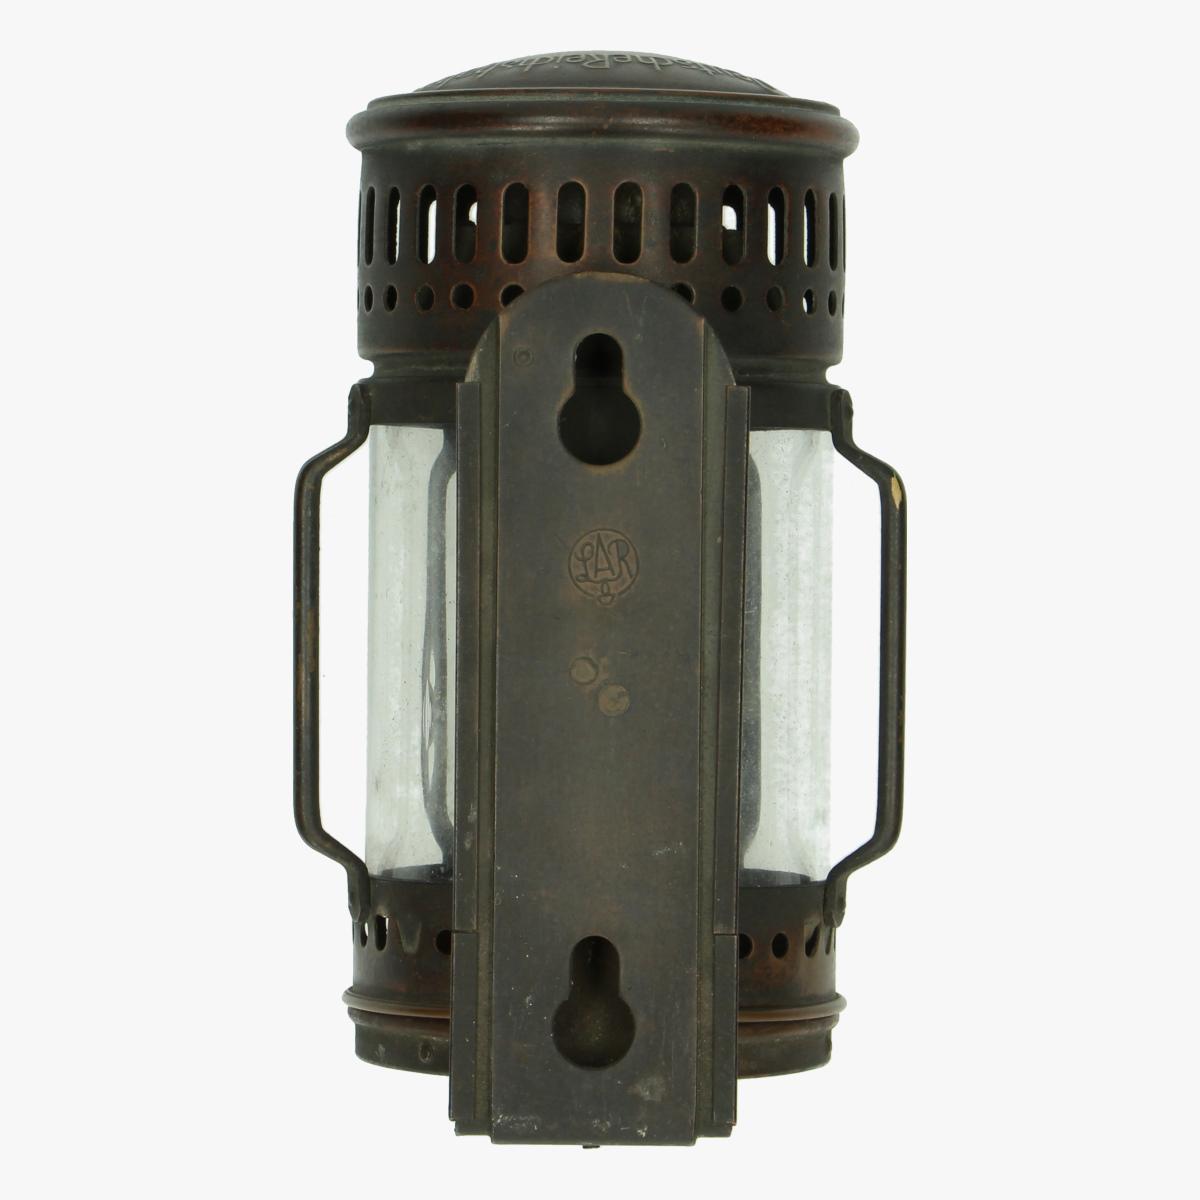 Afbeeldingen van Lamp Deutsche Reichsbahn Gesellschaft LAR 1920-1937